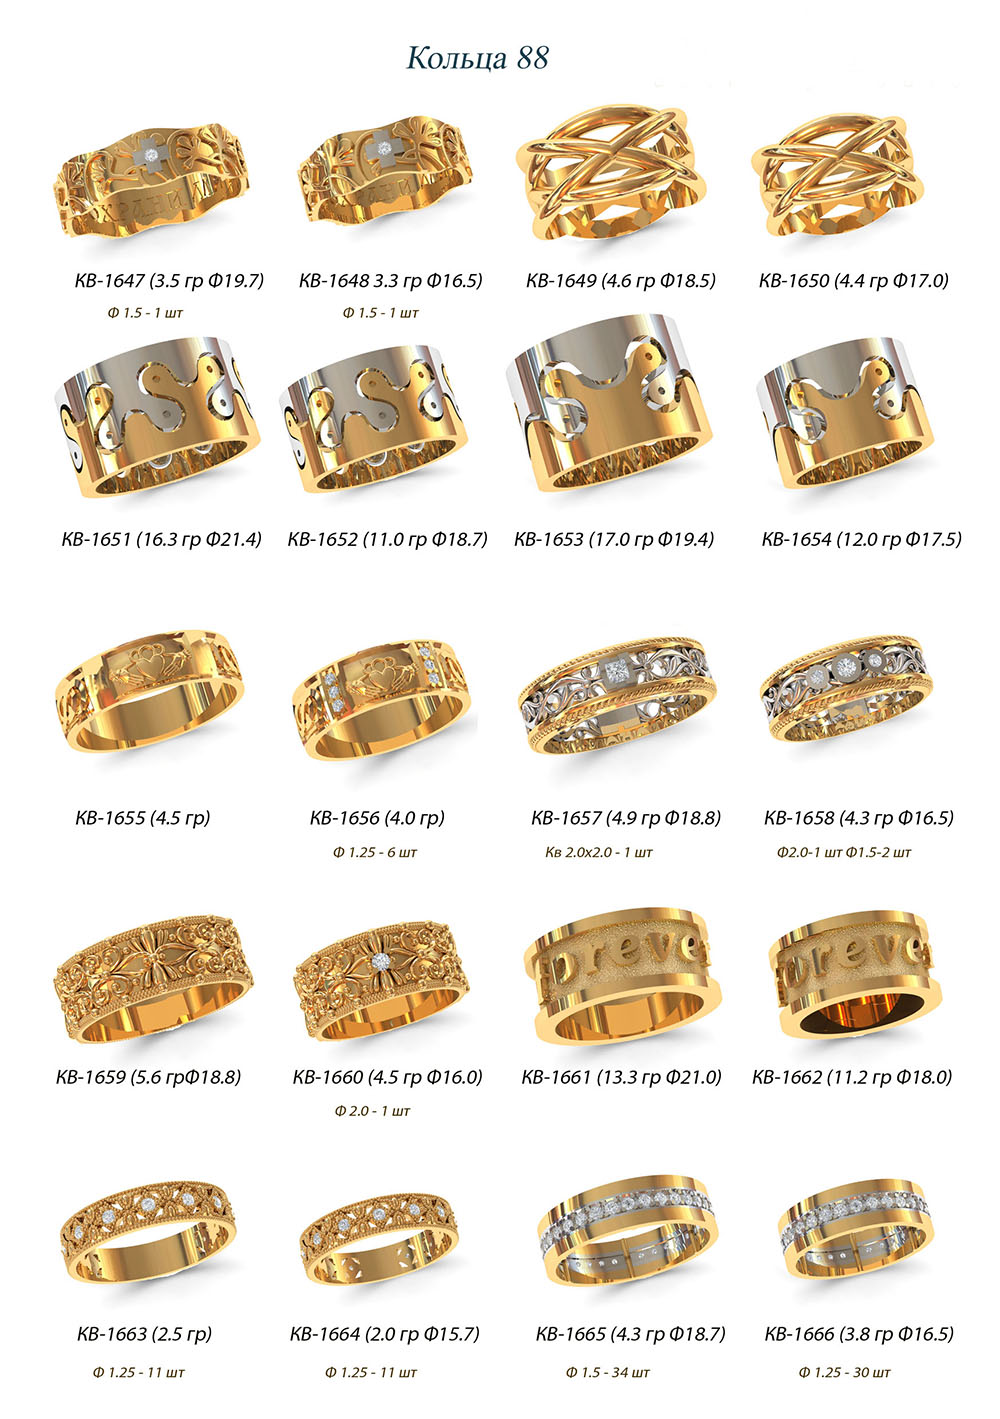 modelit-wax-models-ring-88